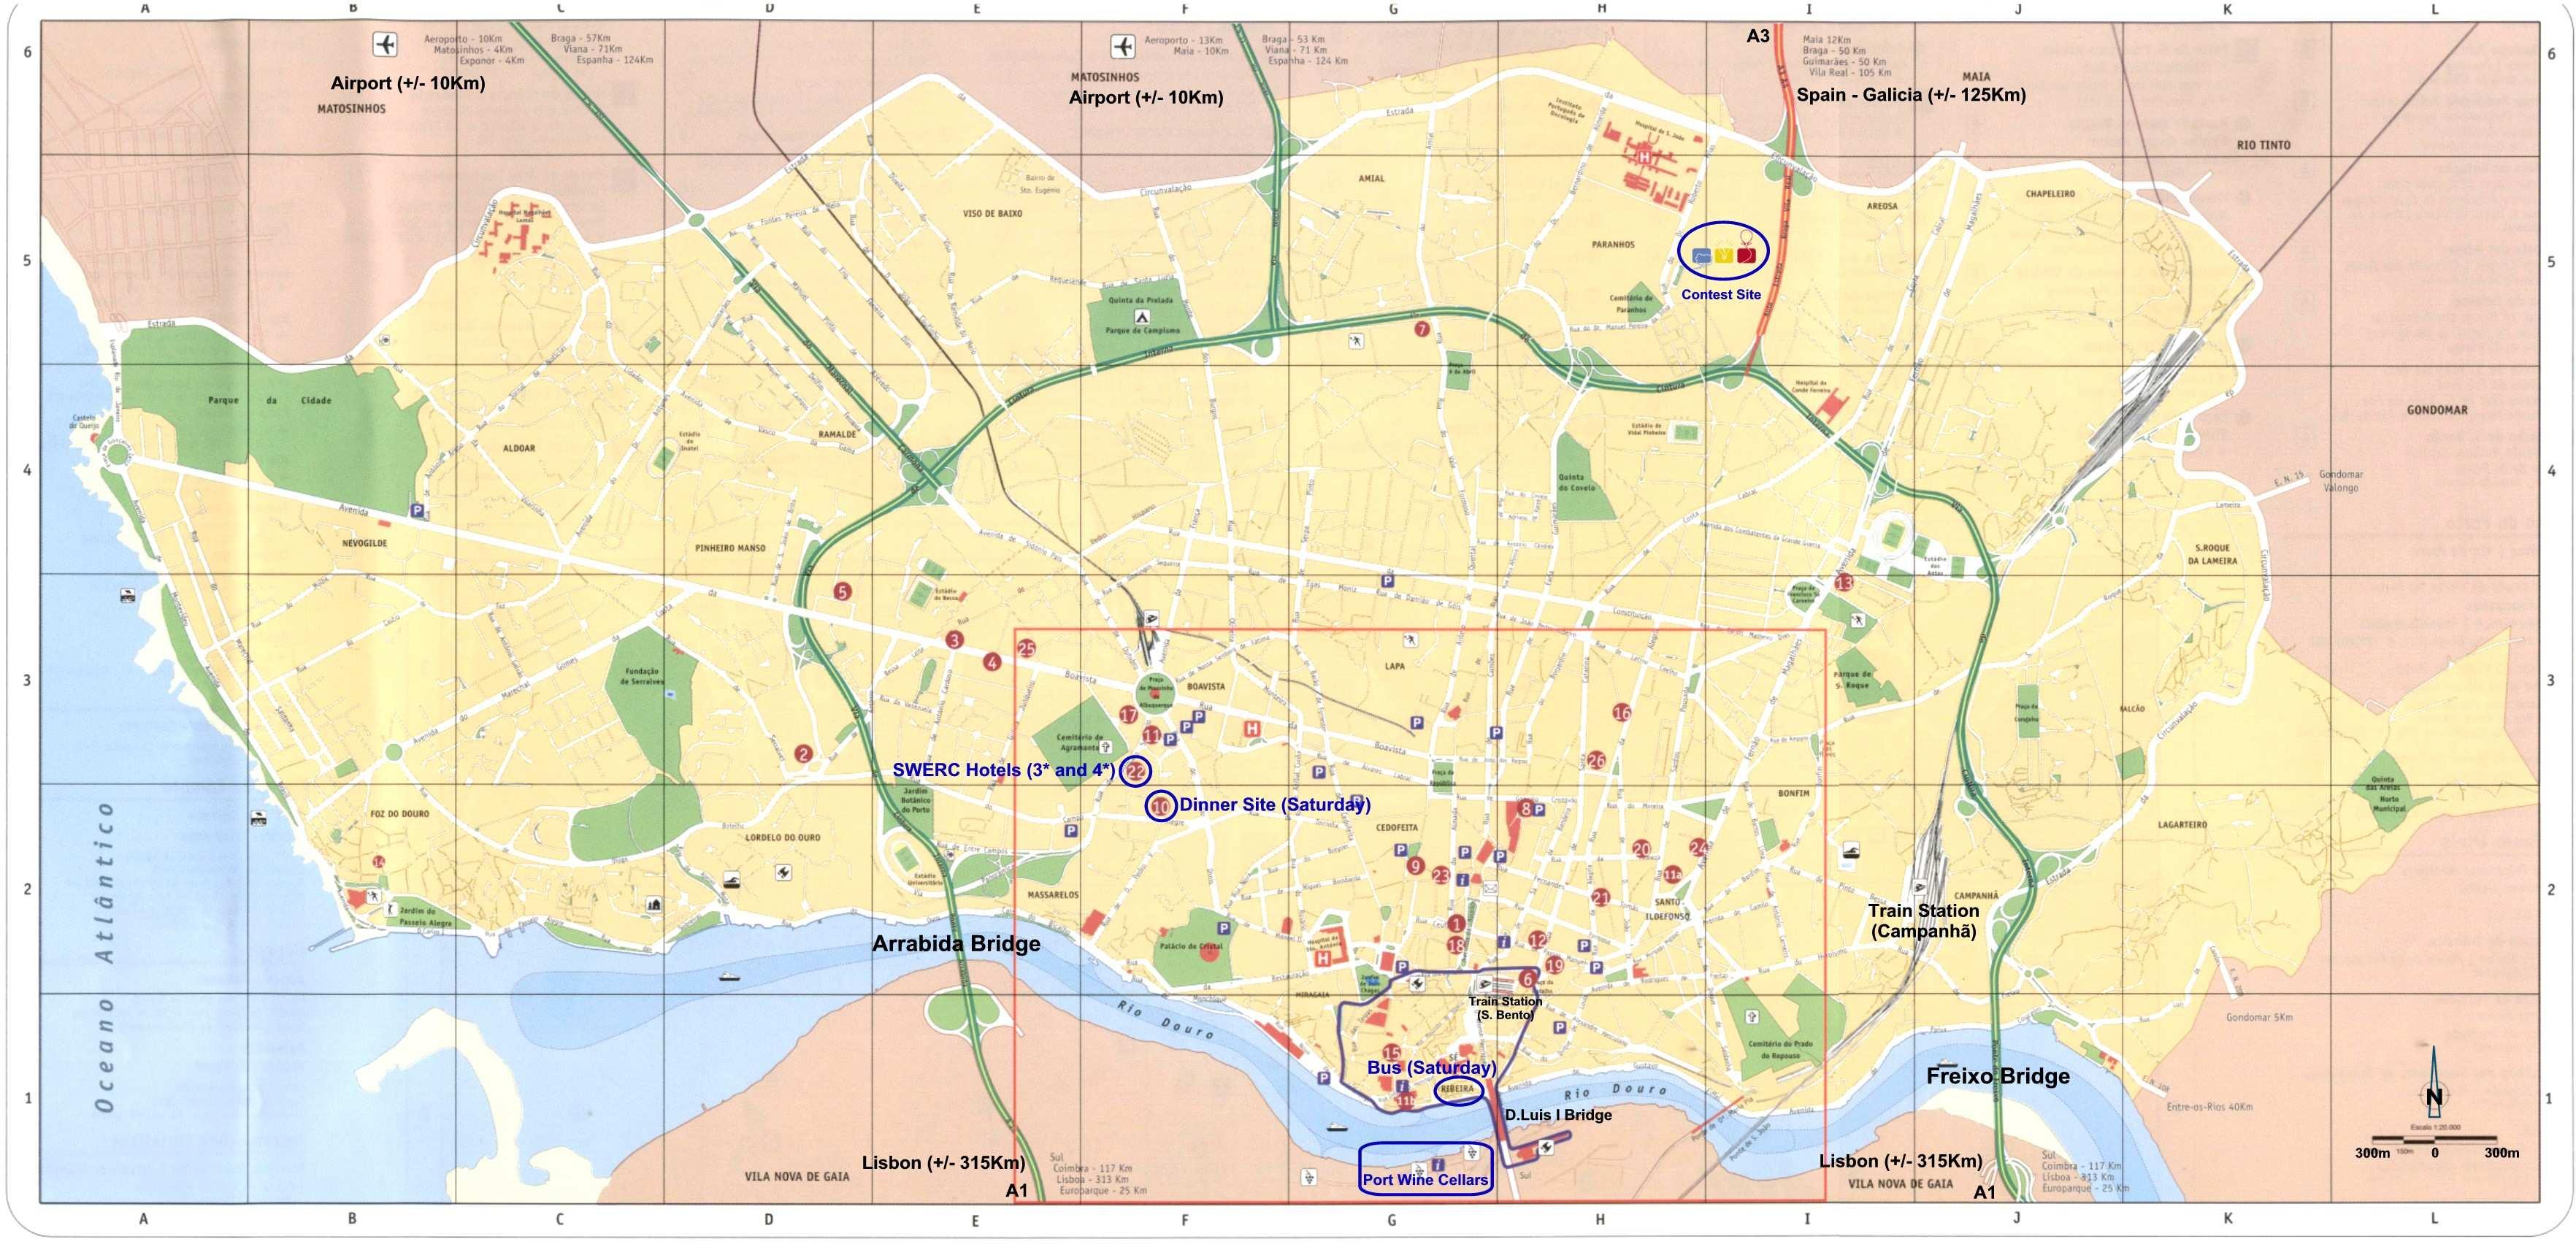 mapa do porto pdf Large Porto Maps for Free Download and Print | High Resolution and  mapa do porto pdf